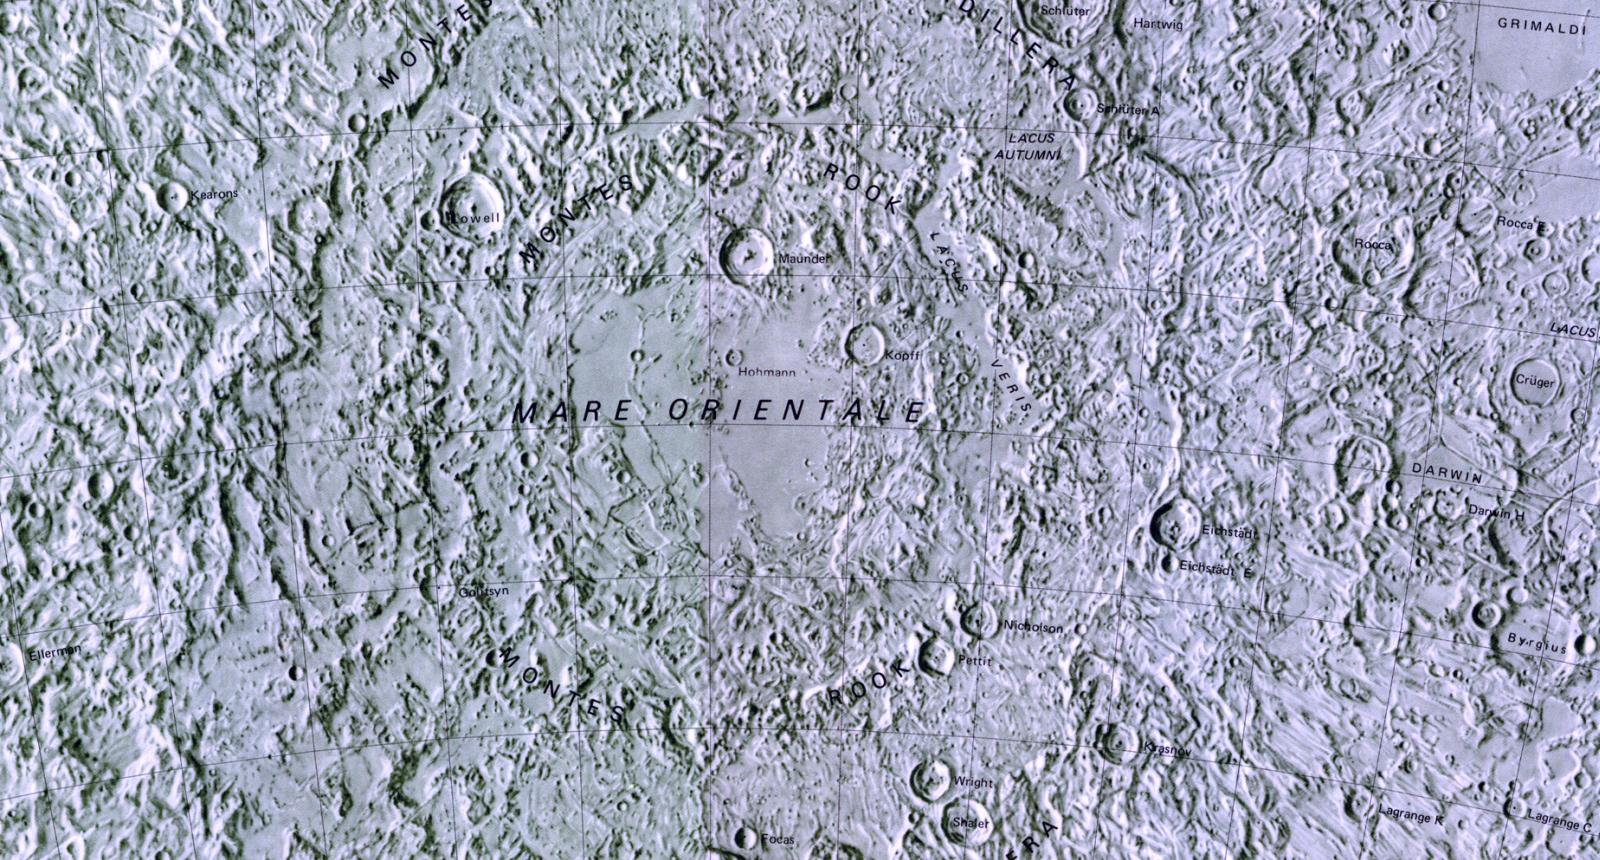 Map of the Moon's Mare Orientale (Lunar Eastern Sea)